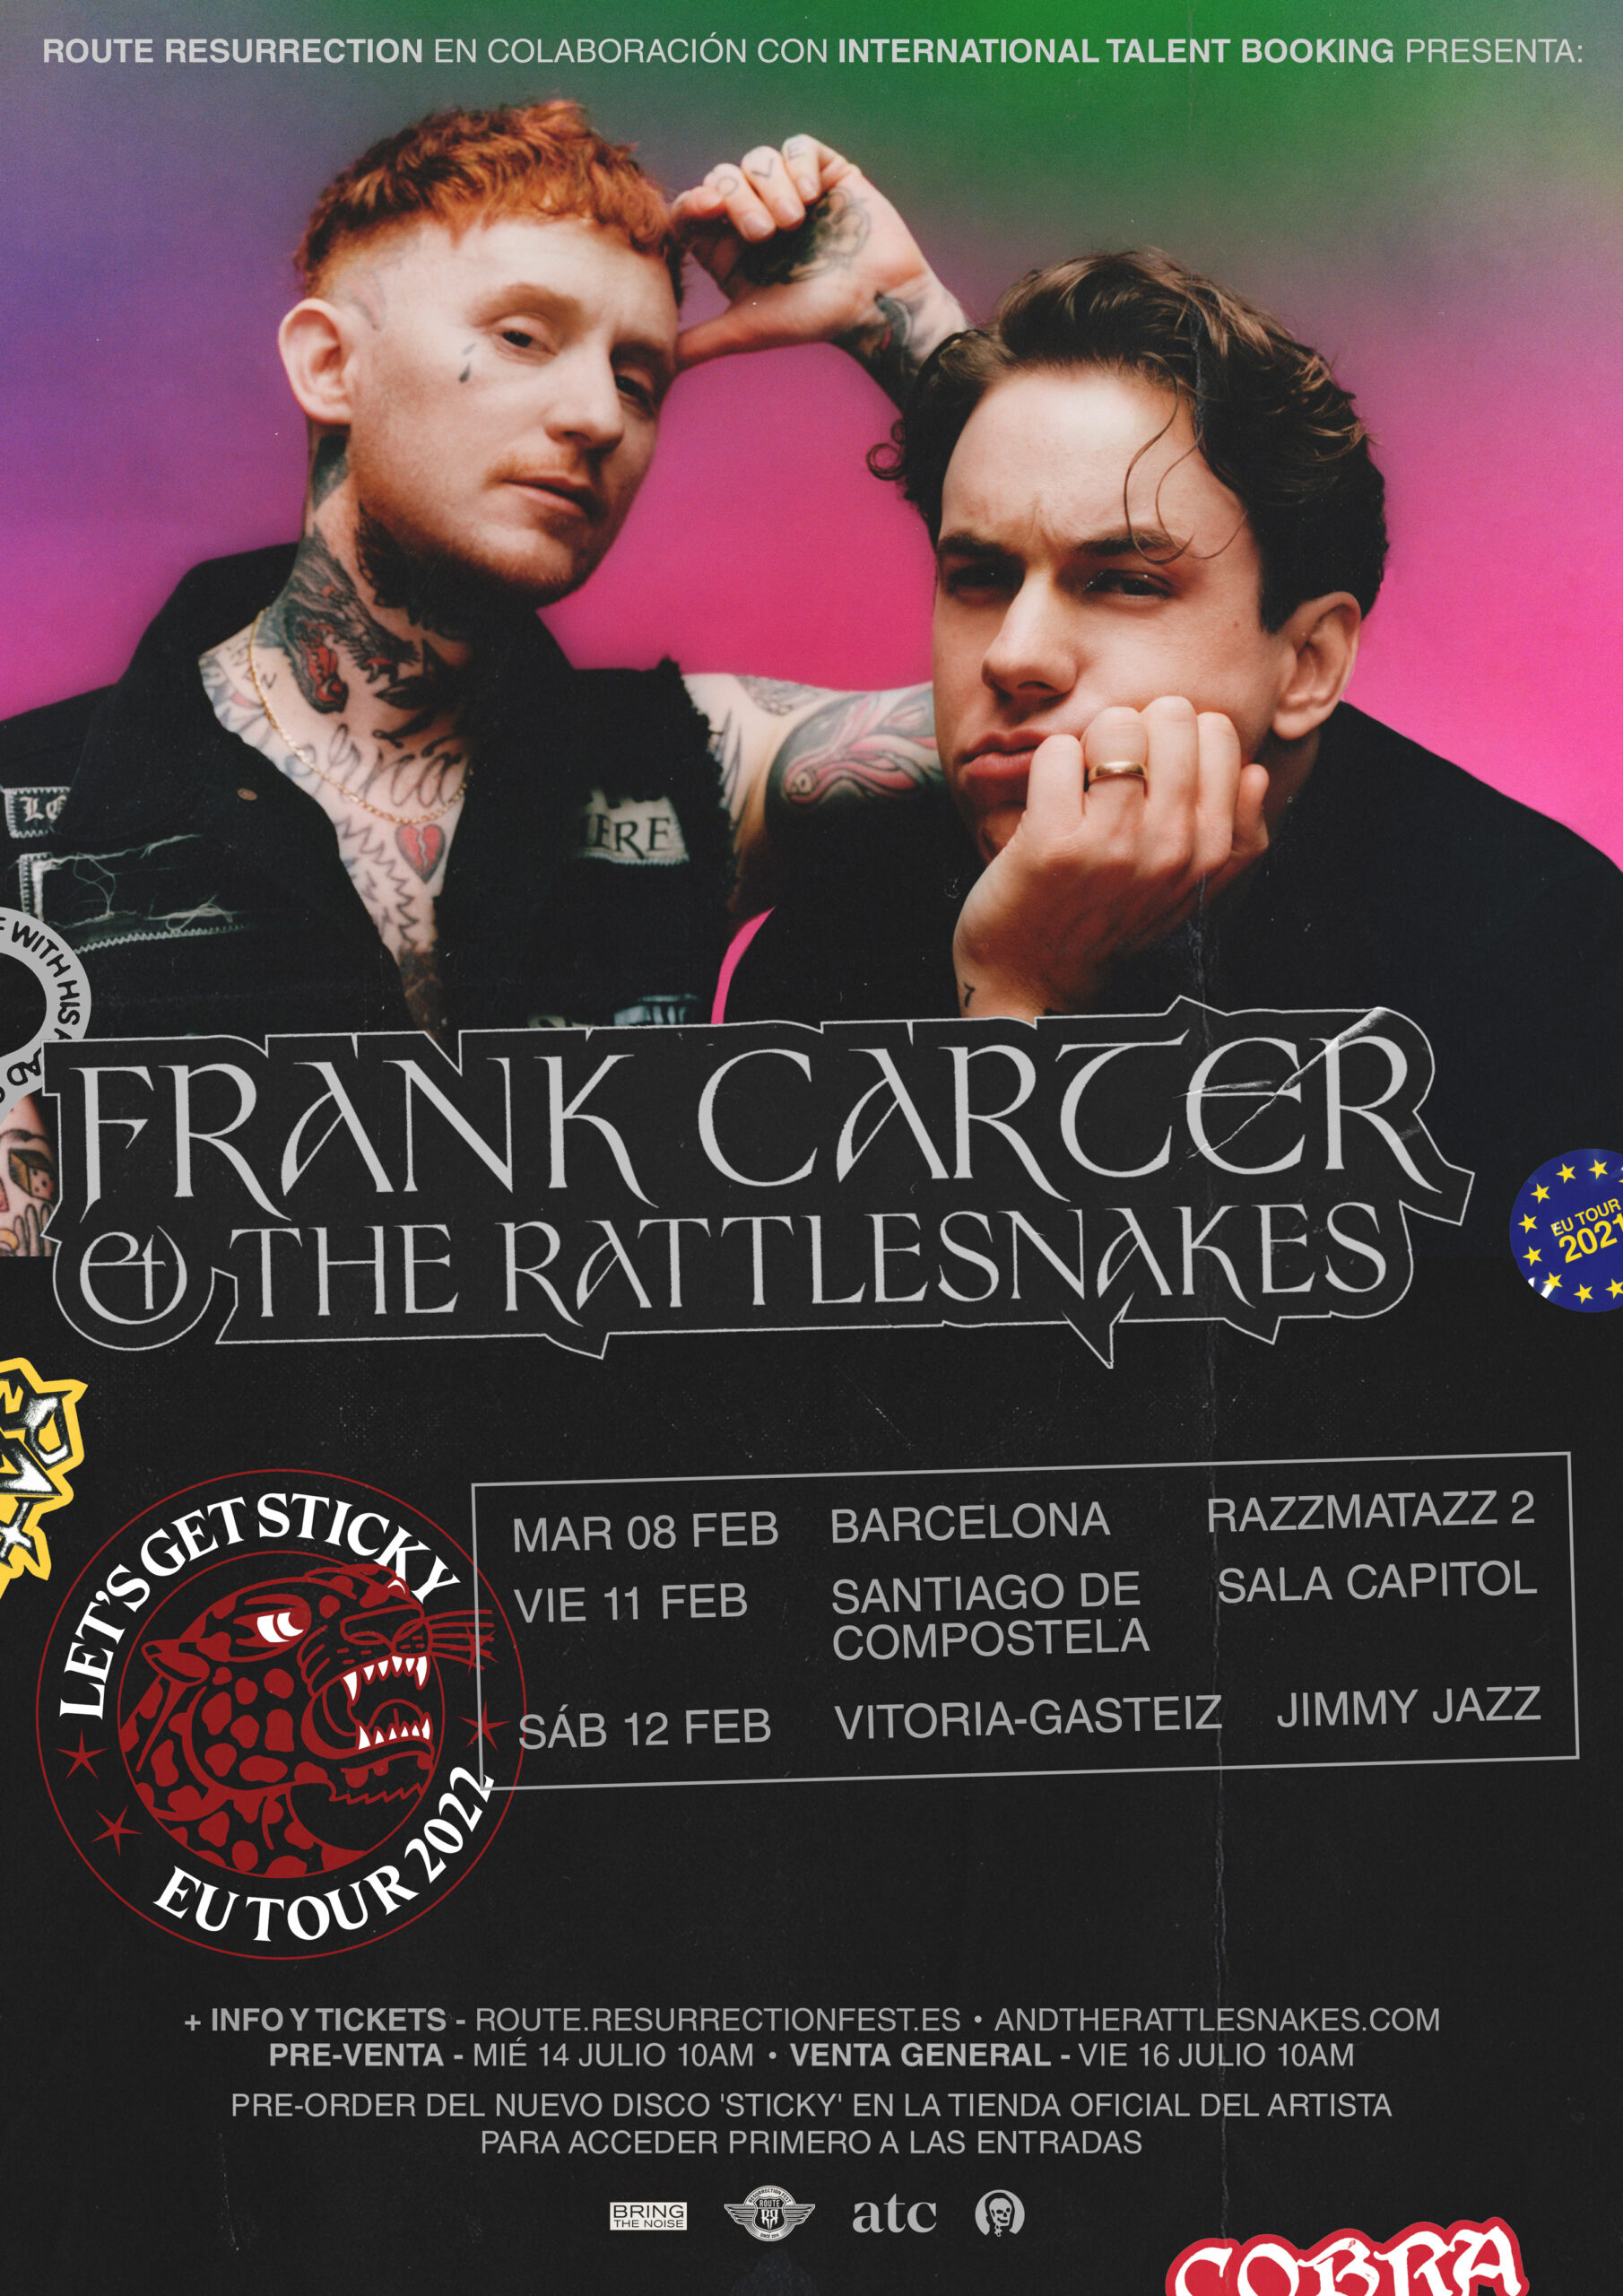 Route Resurrection: Frank Carter & The Rattlesnakes (Vitoria-Gasteiz, 2022)